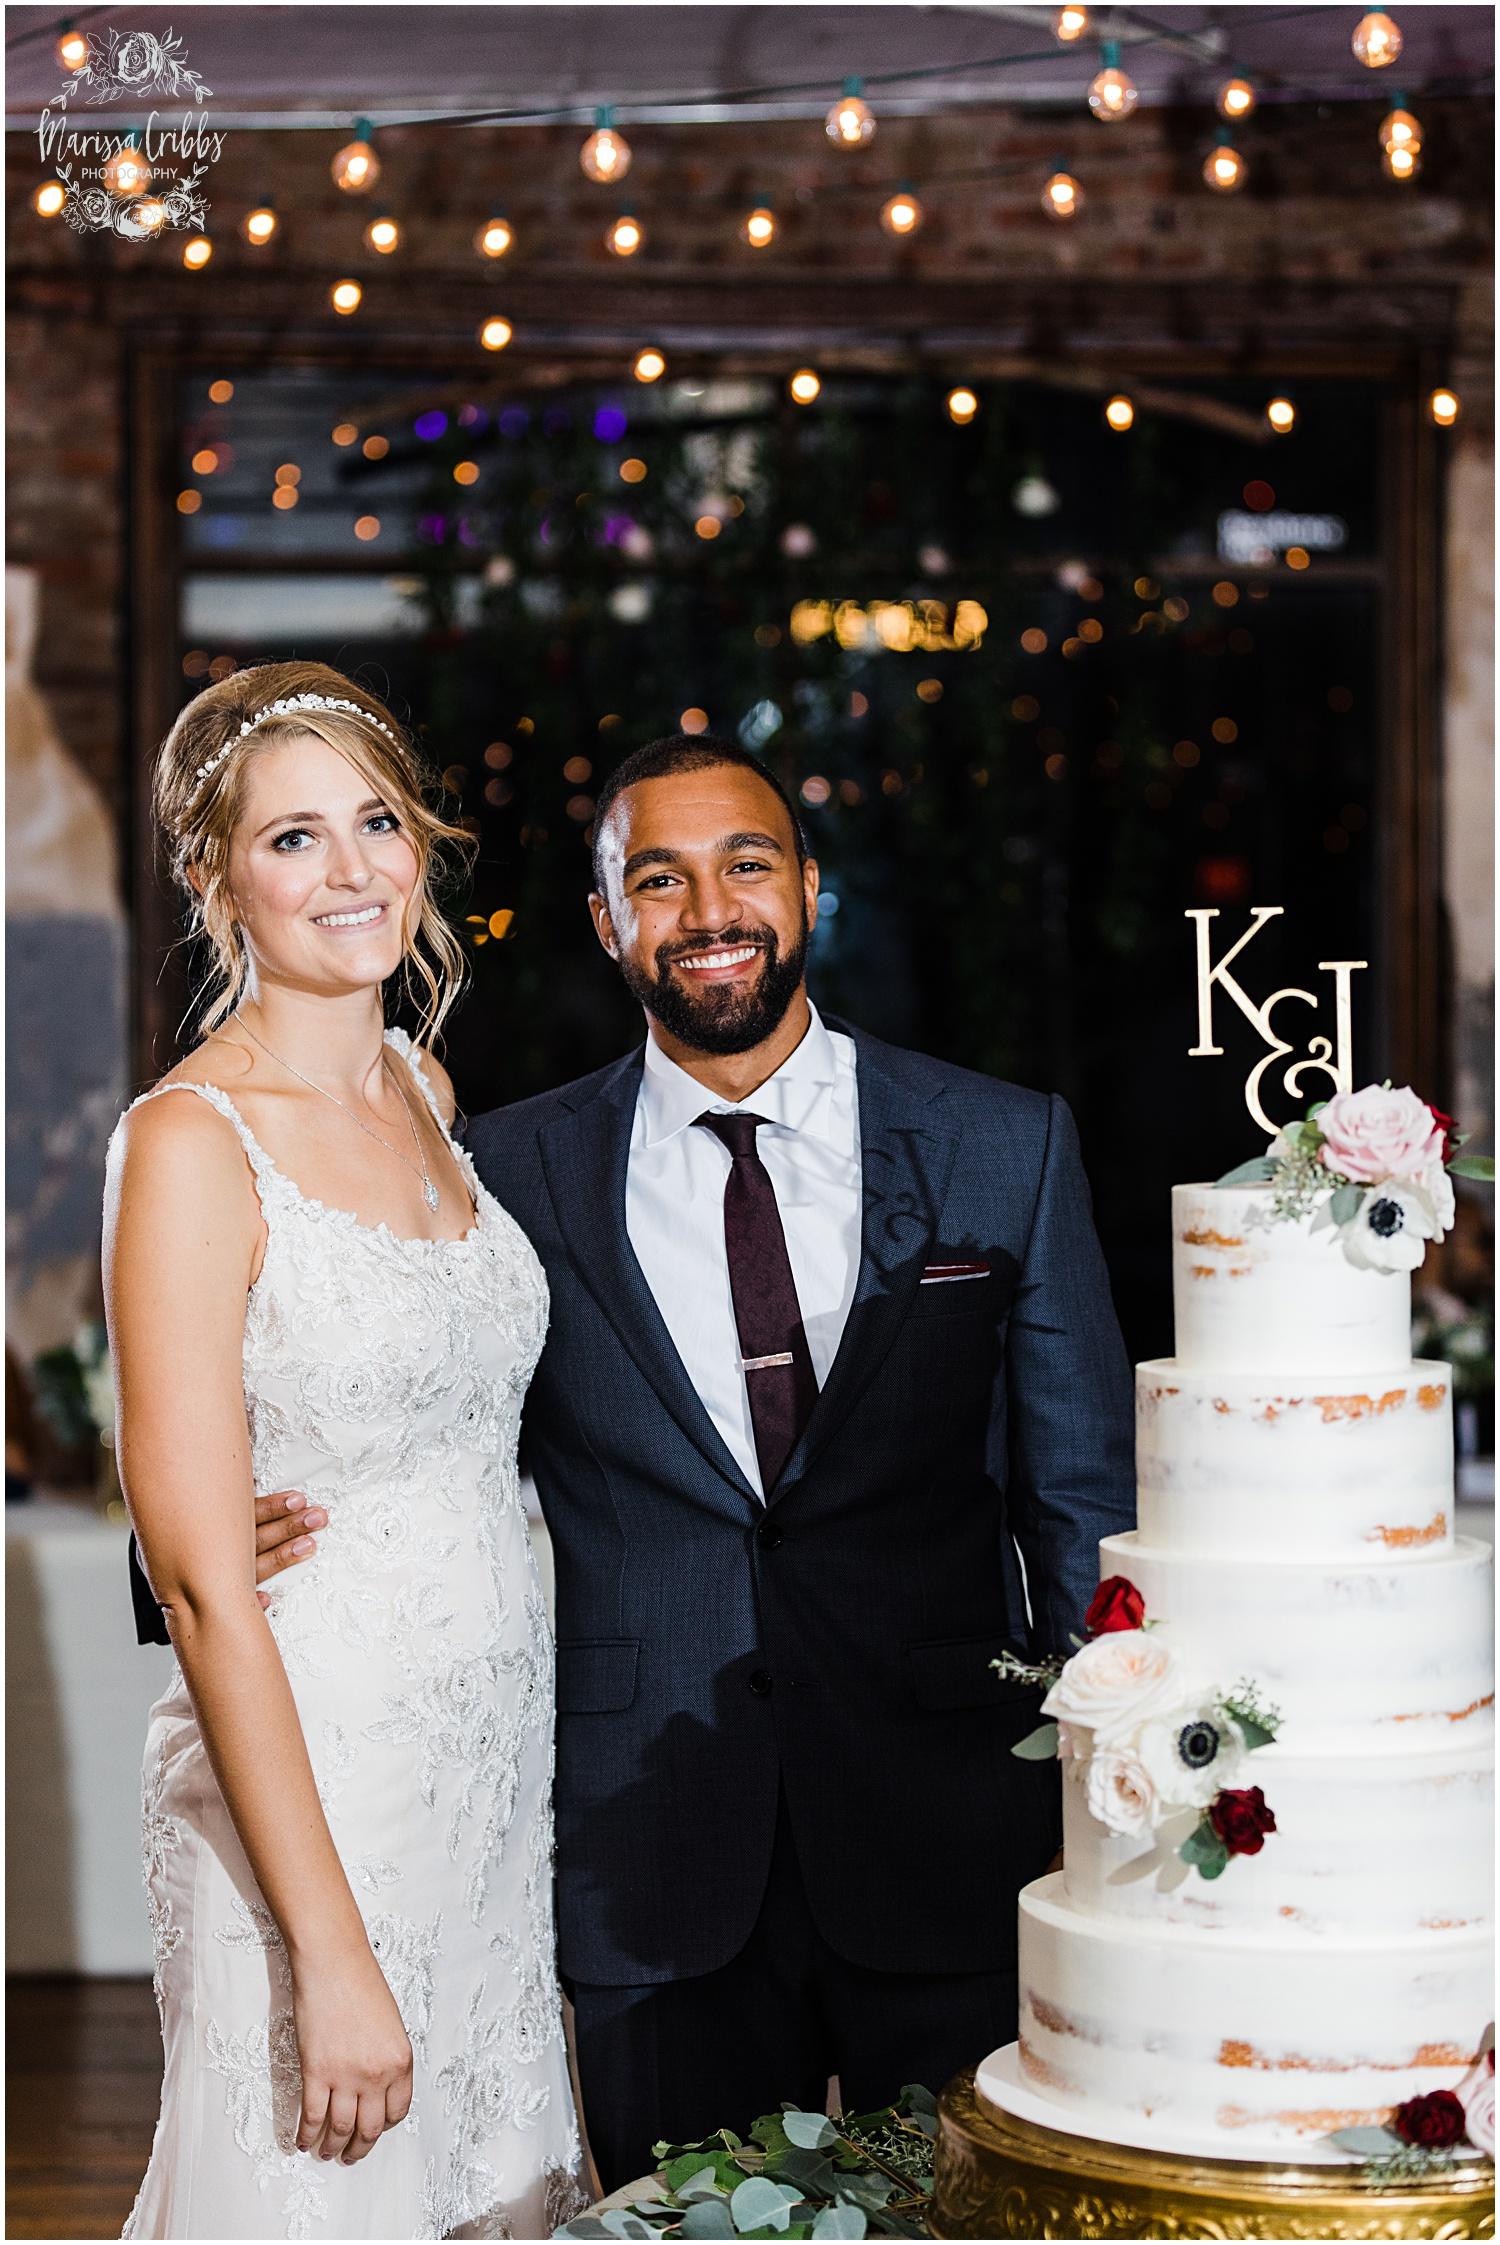 BAUER WEDDING   KELSEA & JUSTIN   MARISSA CRIBBS PHOTOGRAPHY_6585.jpg